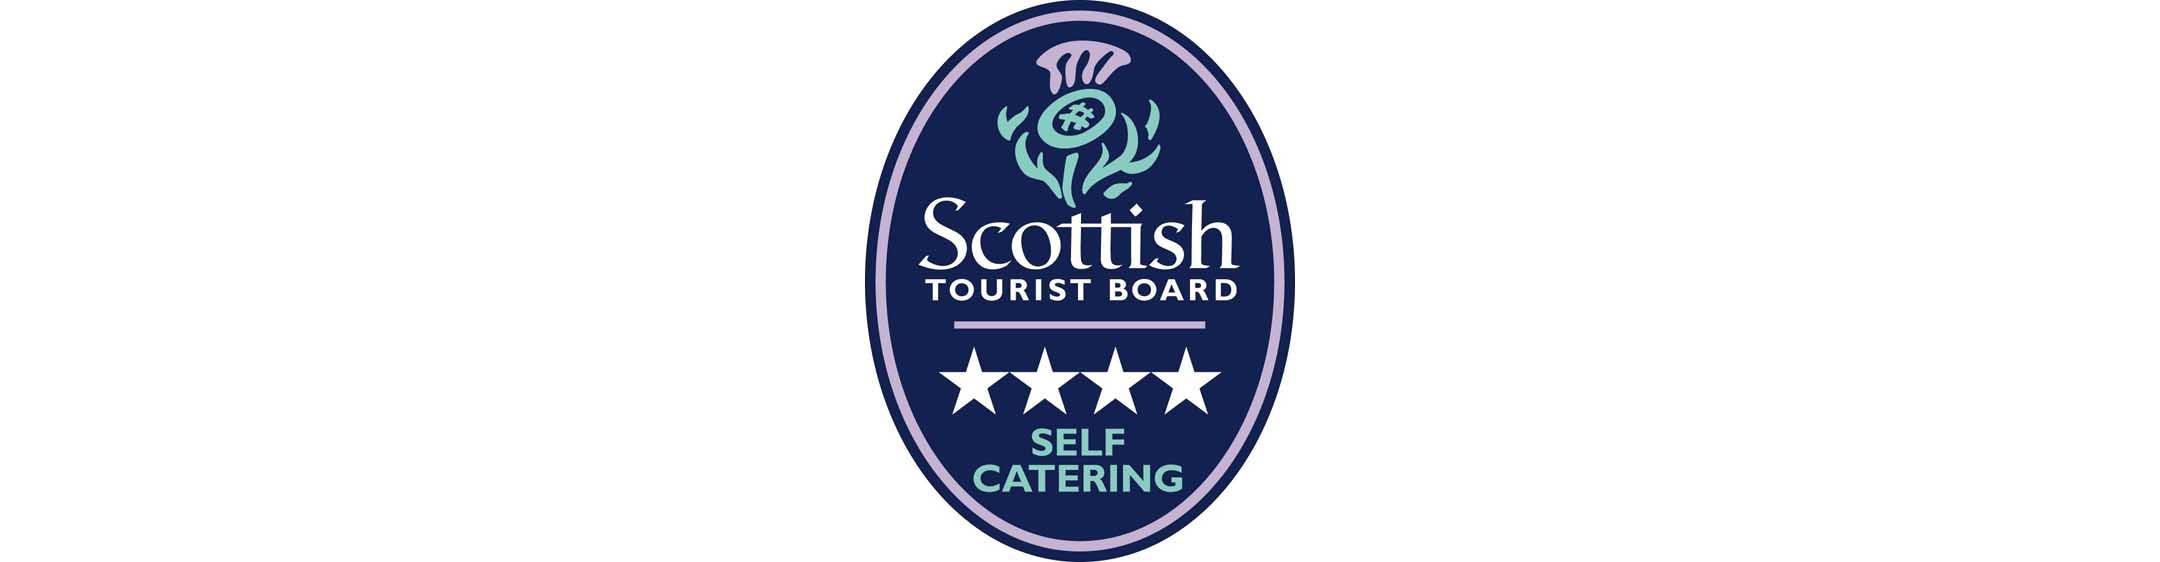 Parkgate Residence Edinburgh Visit Scotland 4 Star Rating